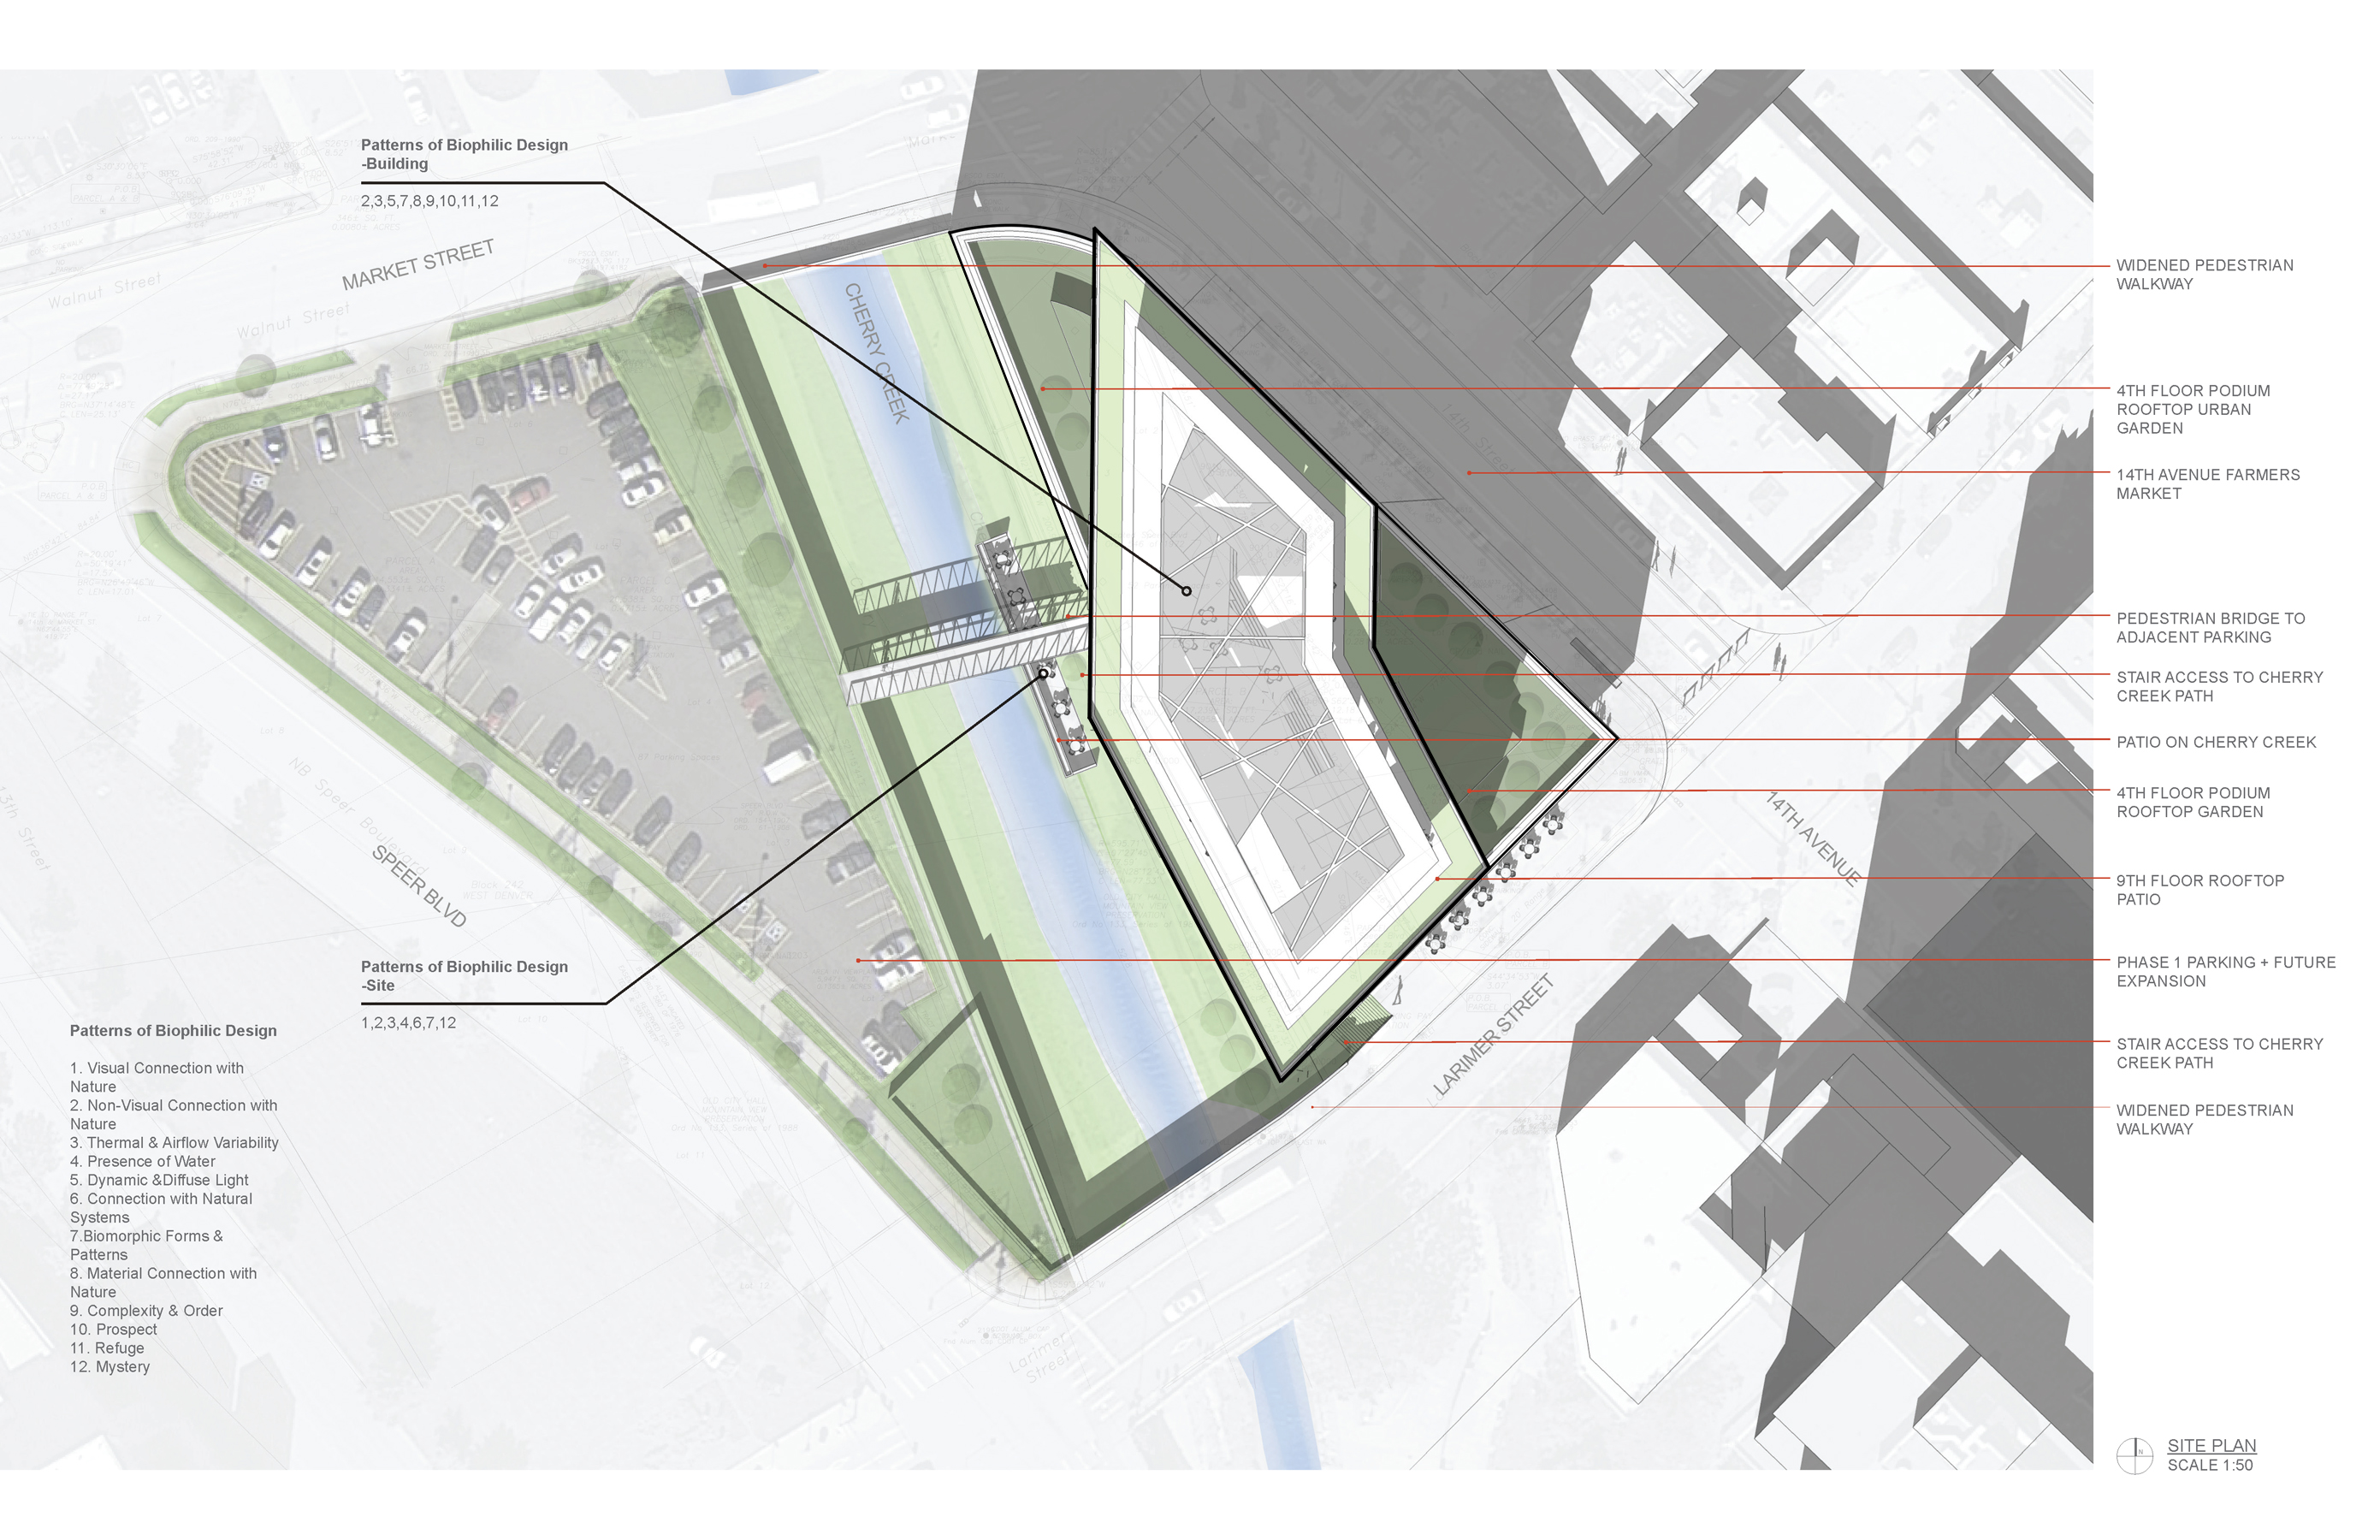 3 14th and Larimer site plan open studio architecture